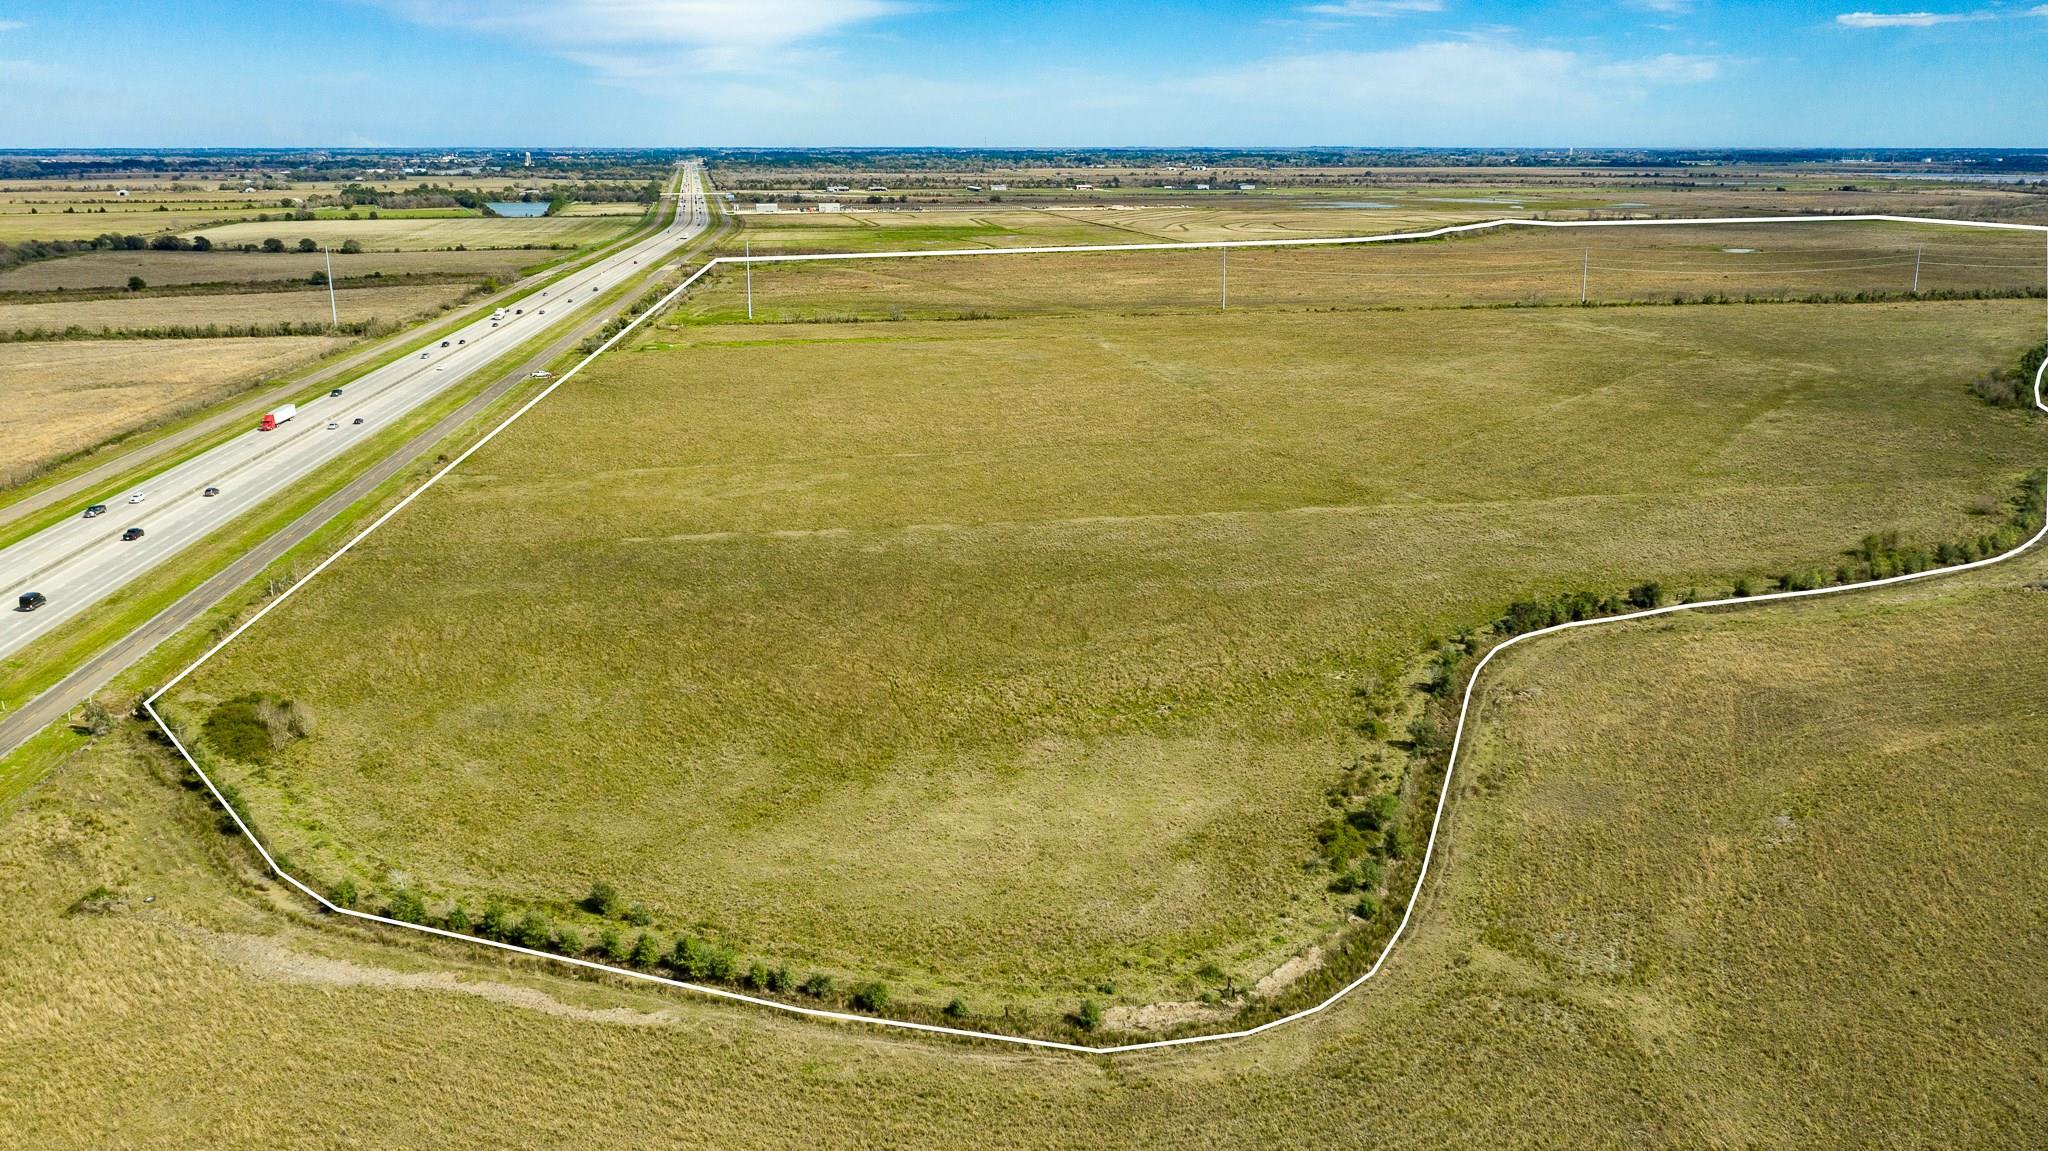 000 E Interstate 10 Property Photo - Winnie, TX real estate listing